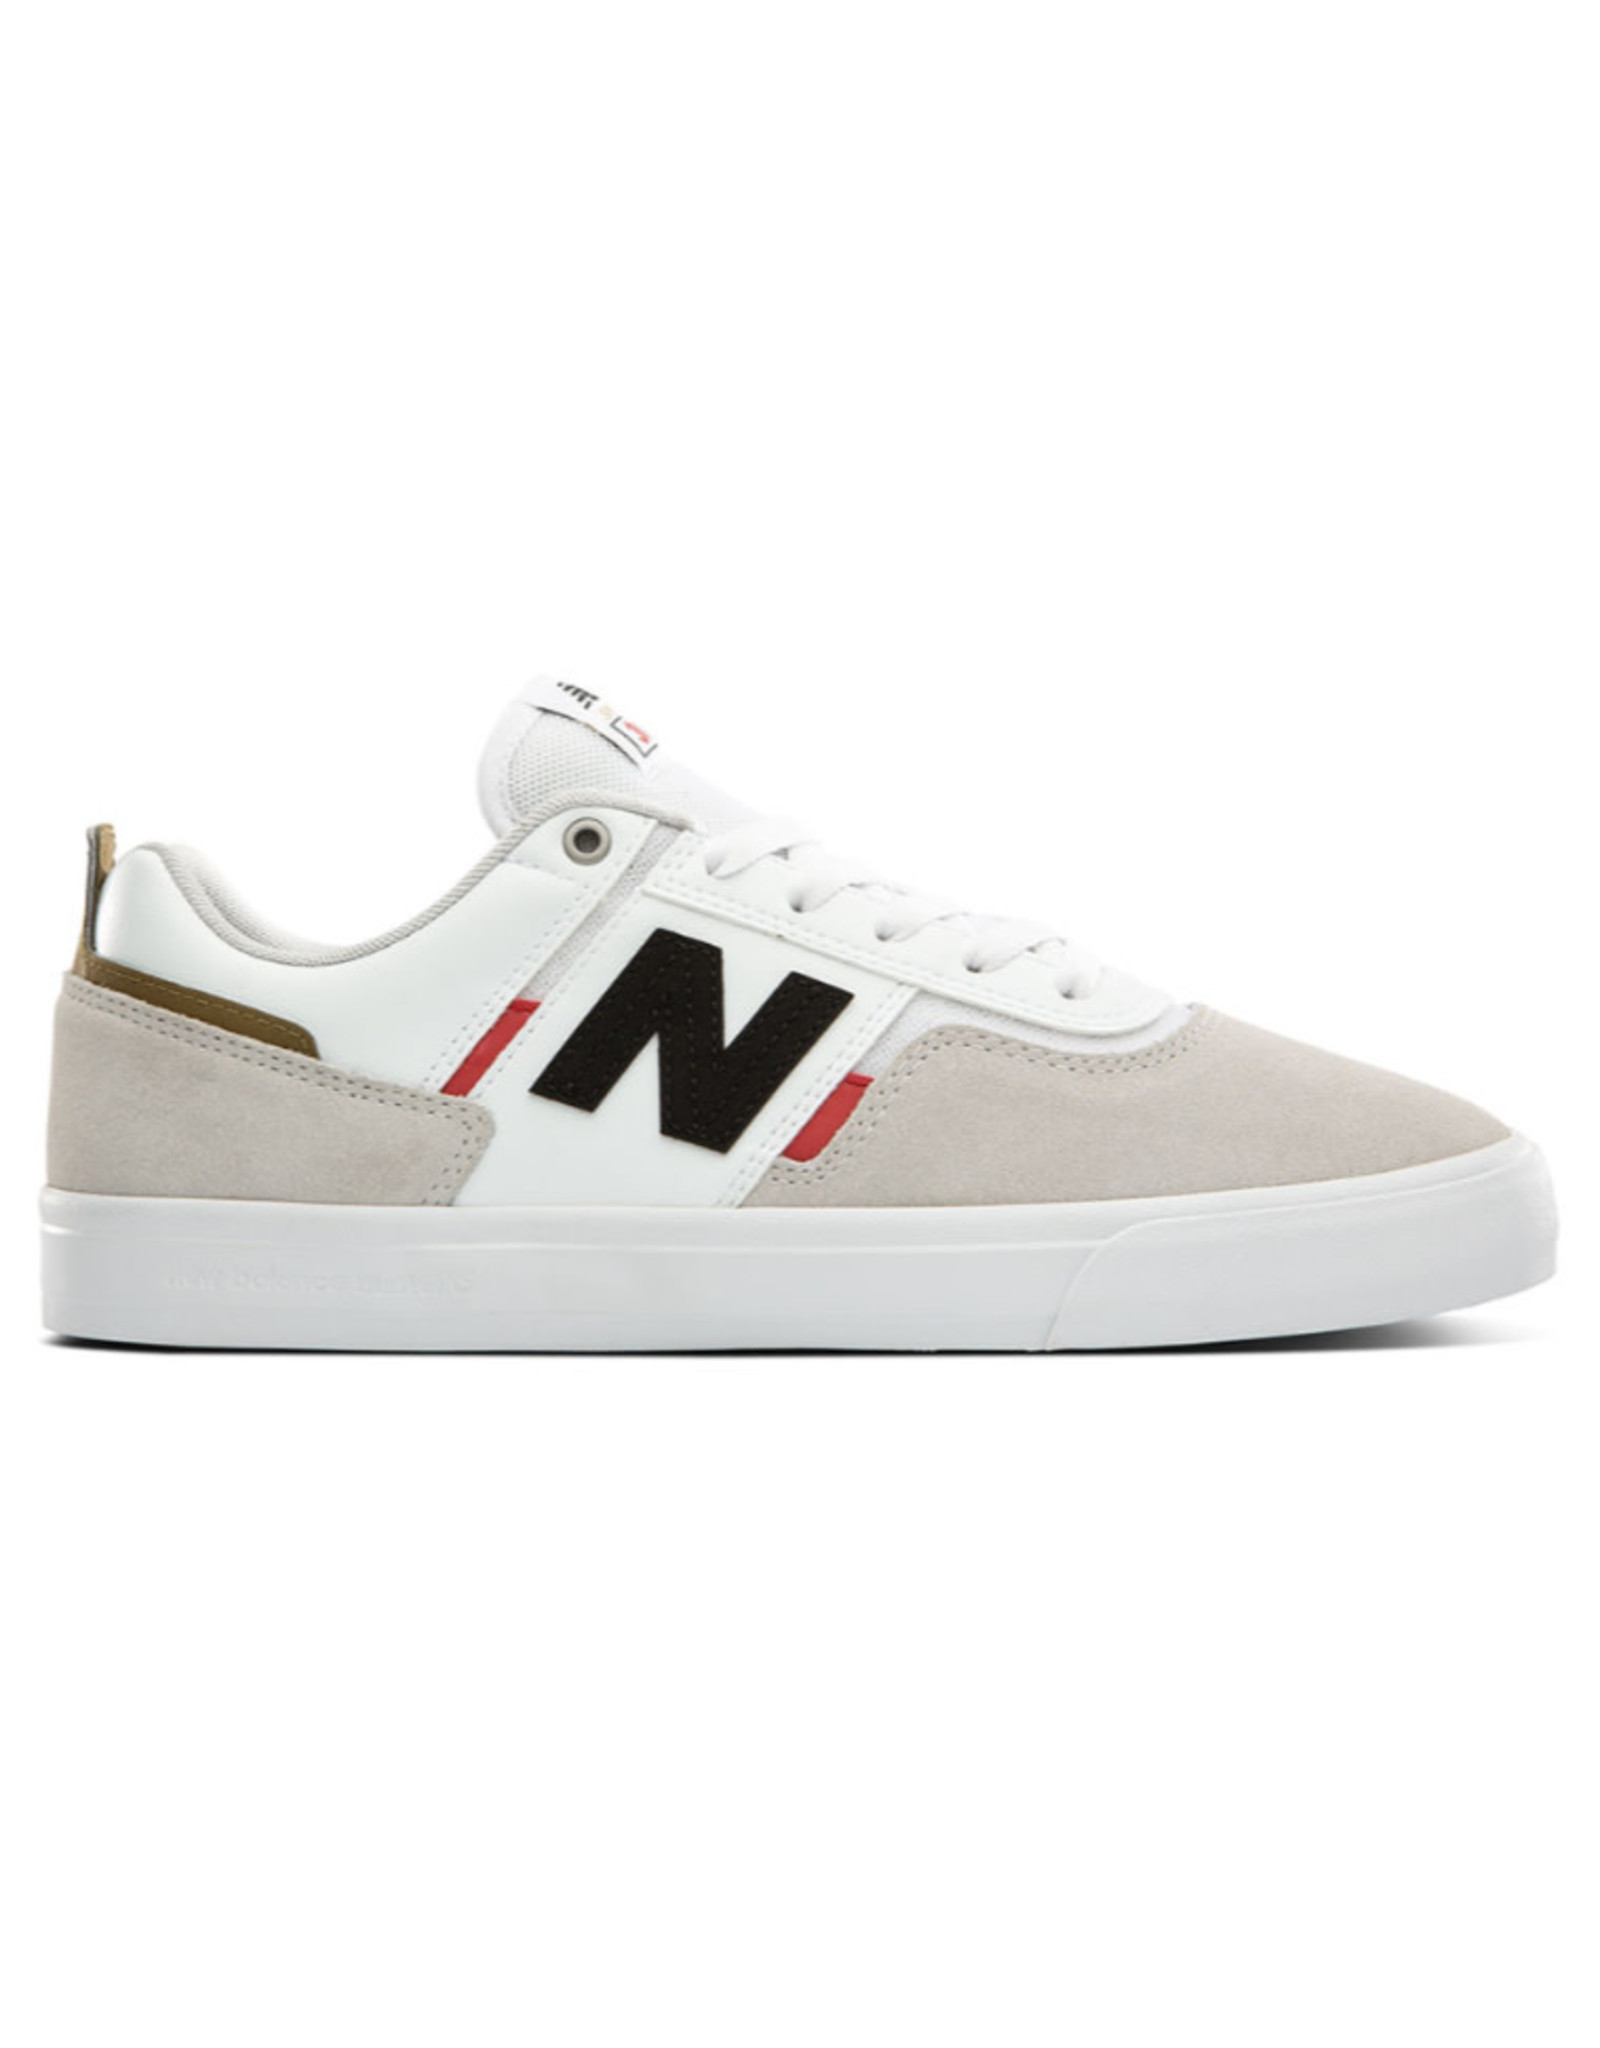 New Balance 306 MAR